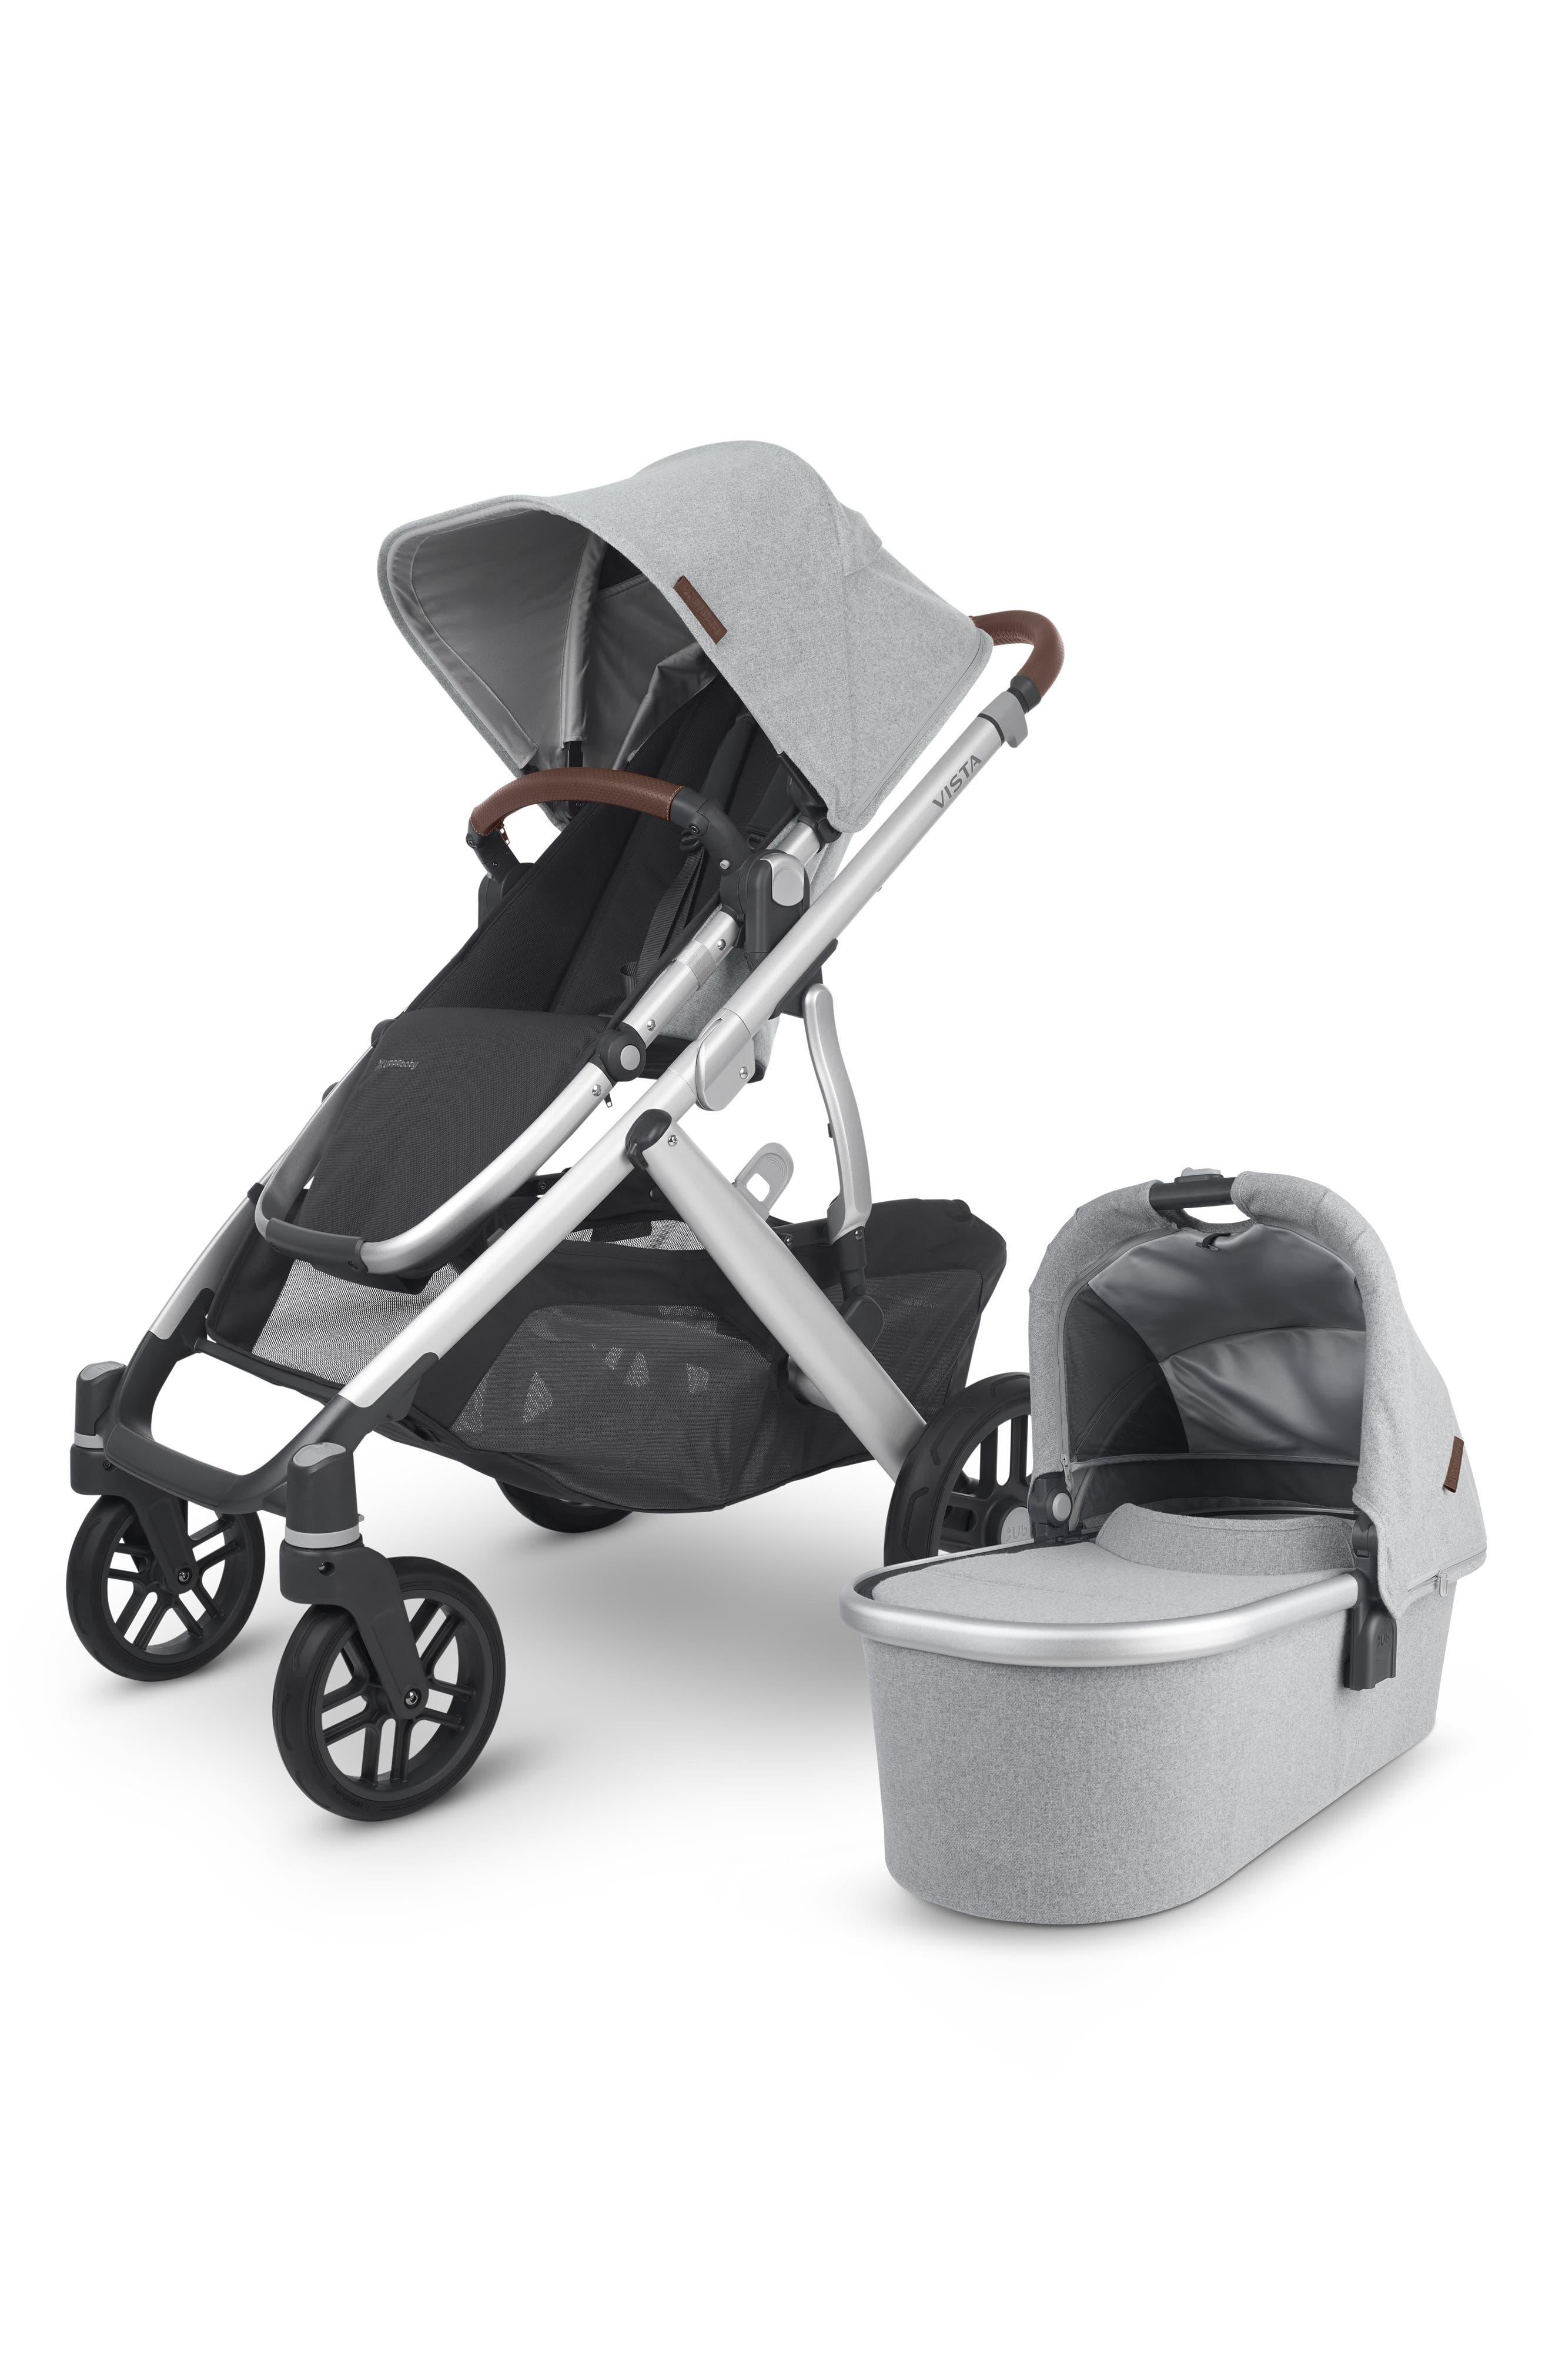 UPPAbaby Infant Uppababy Vista V2 Stella Stroller With Bassinet, Size One Size - Grey